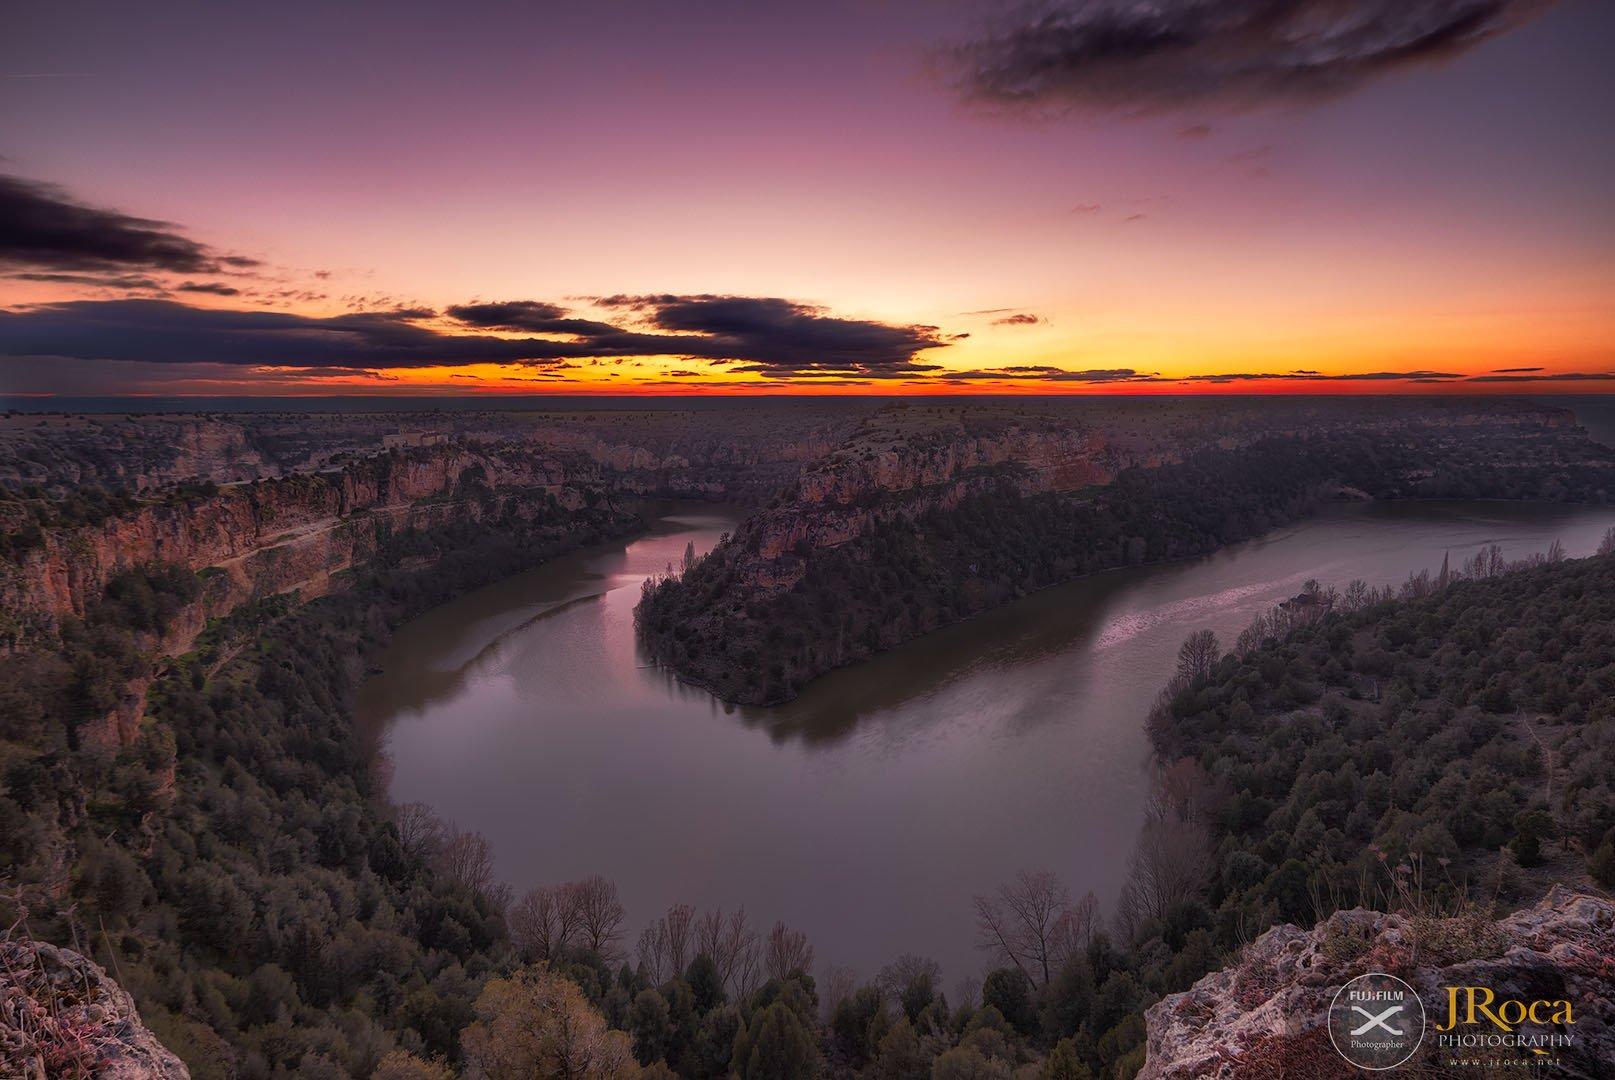 Nice colors #SerieX #FujifilmXWorldes #esFujifilmX @fujifilm_es @FOTOGRAFIARTE2 @fotodng @Fujistas @landscapesspain https://t.co/UPI4qCkR5g